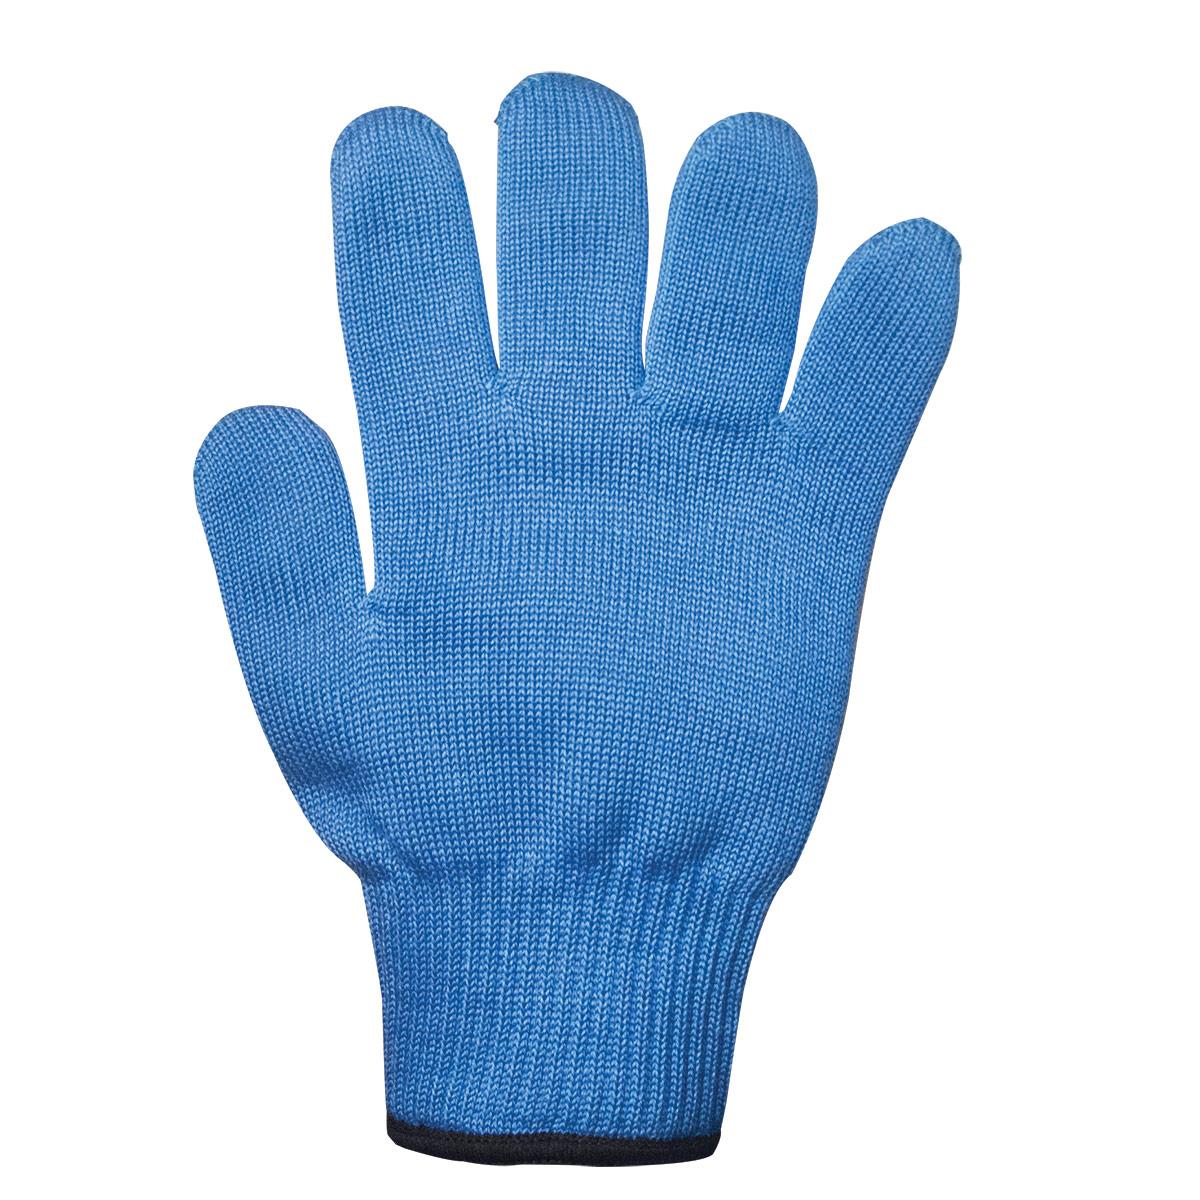 Heat Oven Glove - Blue